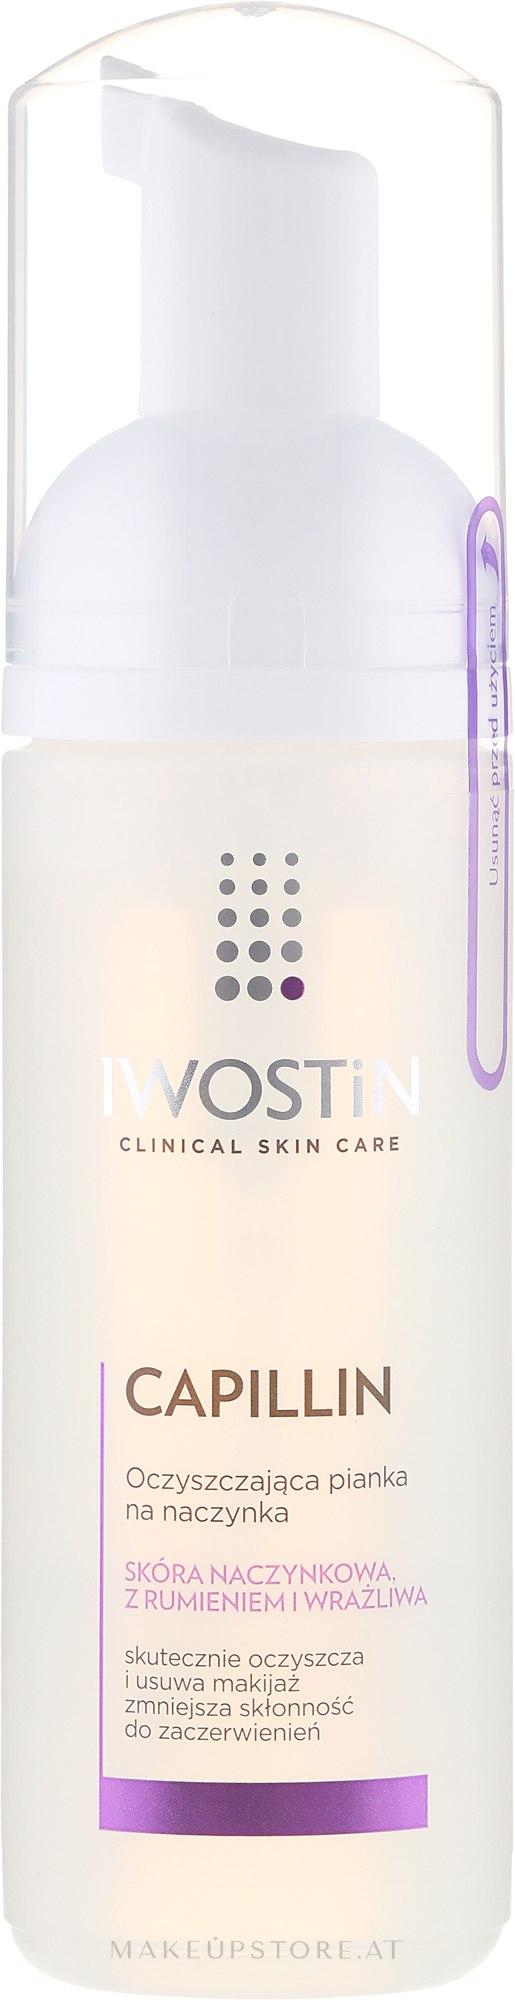 Gesichtsreinigungsschaum - Iwostin Capilin Reinforcement Foam — Bild 165 ml